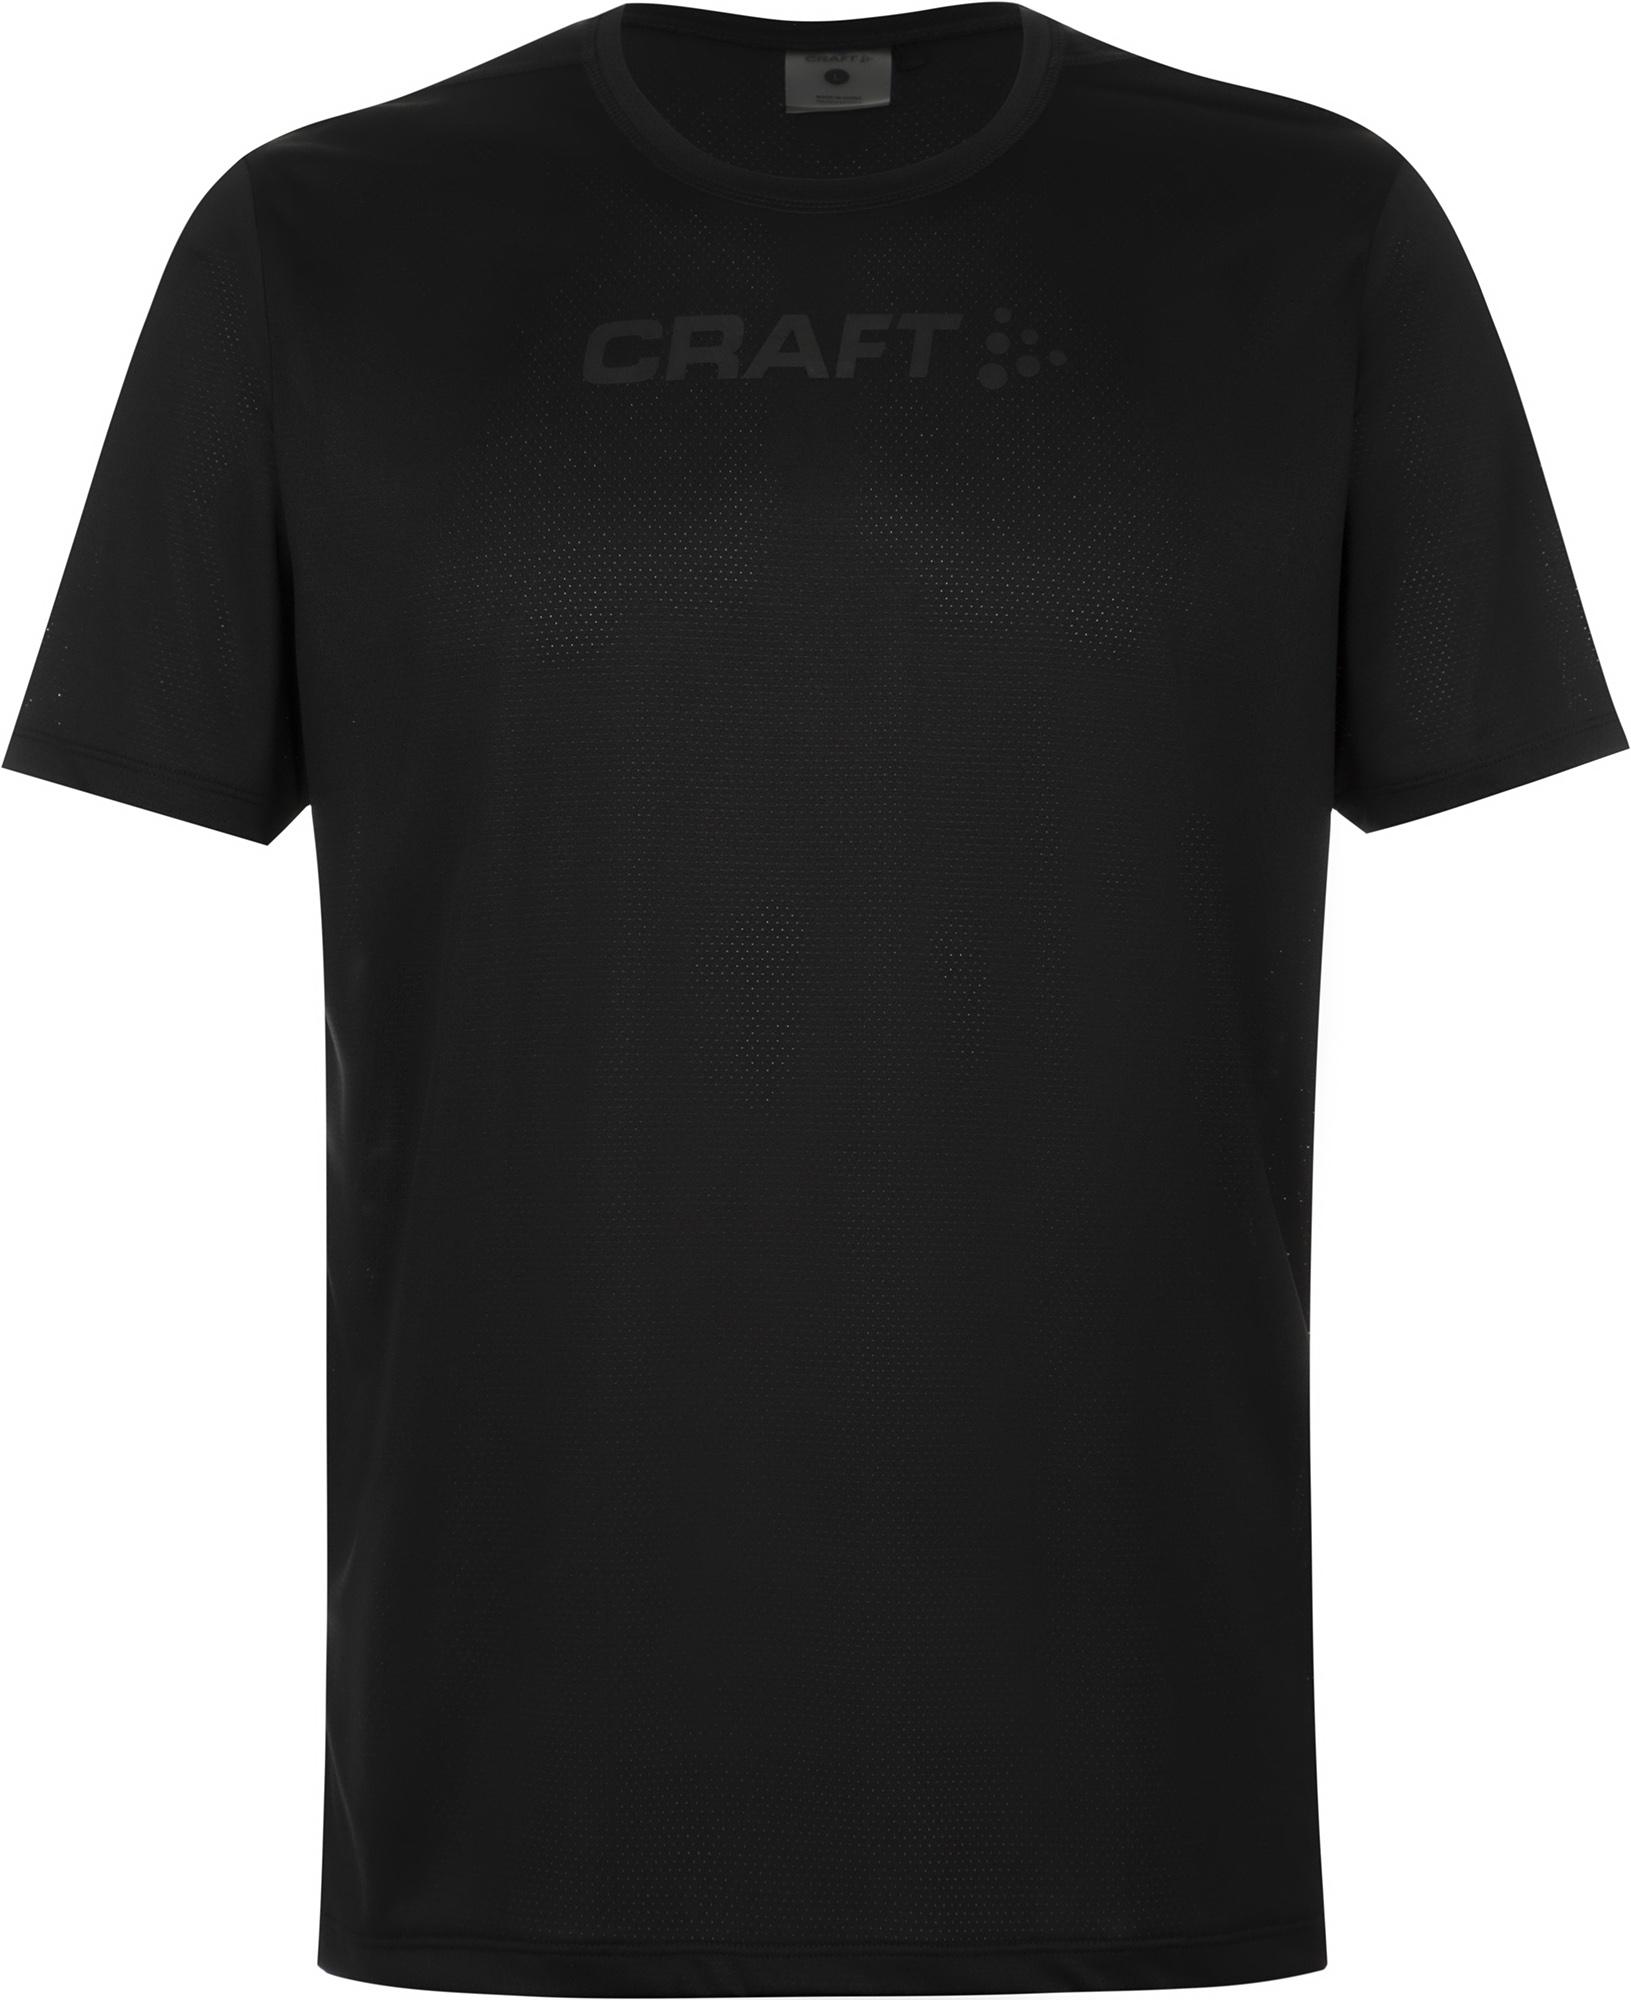 Фото - Craft Футболка мужская Craft Core Essence, размер 46-48 craft шорты мужские craft essence размер 46 48